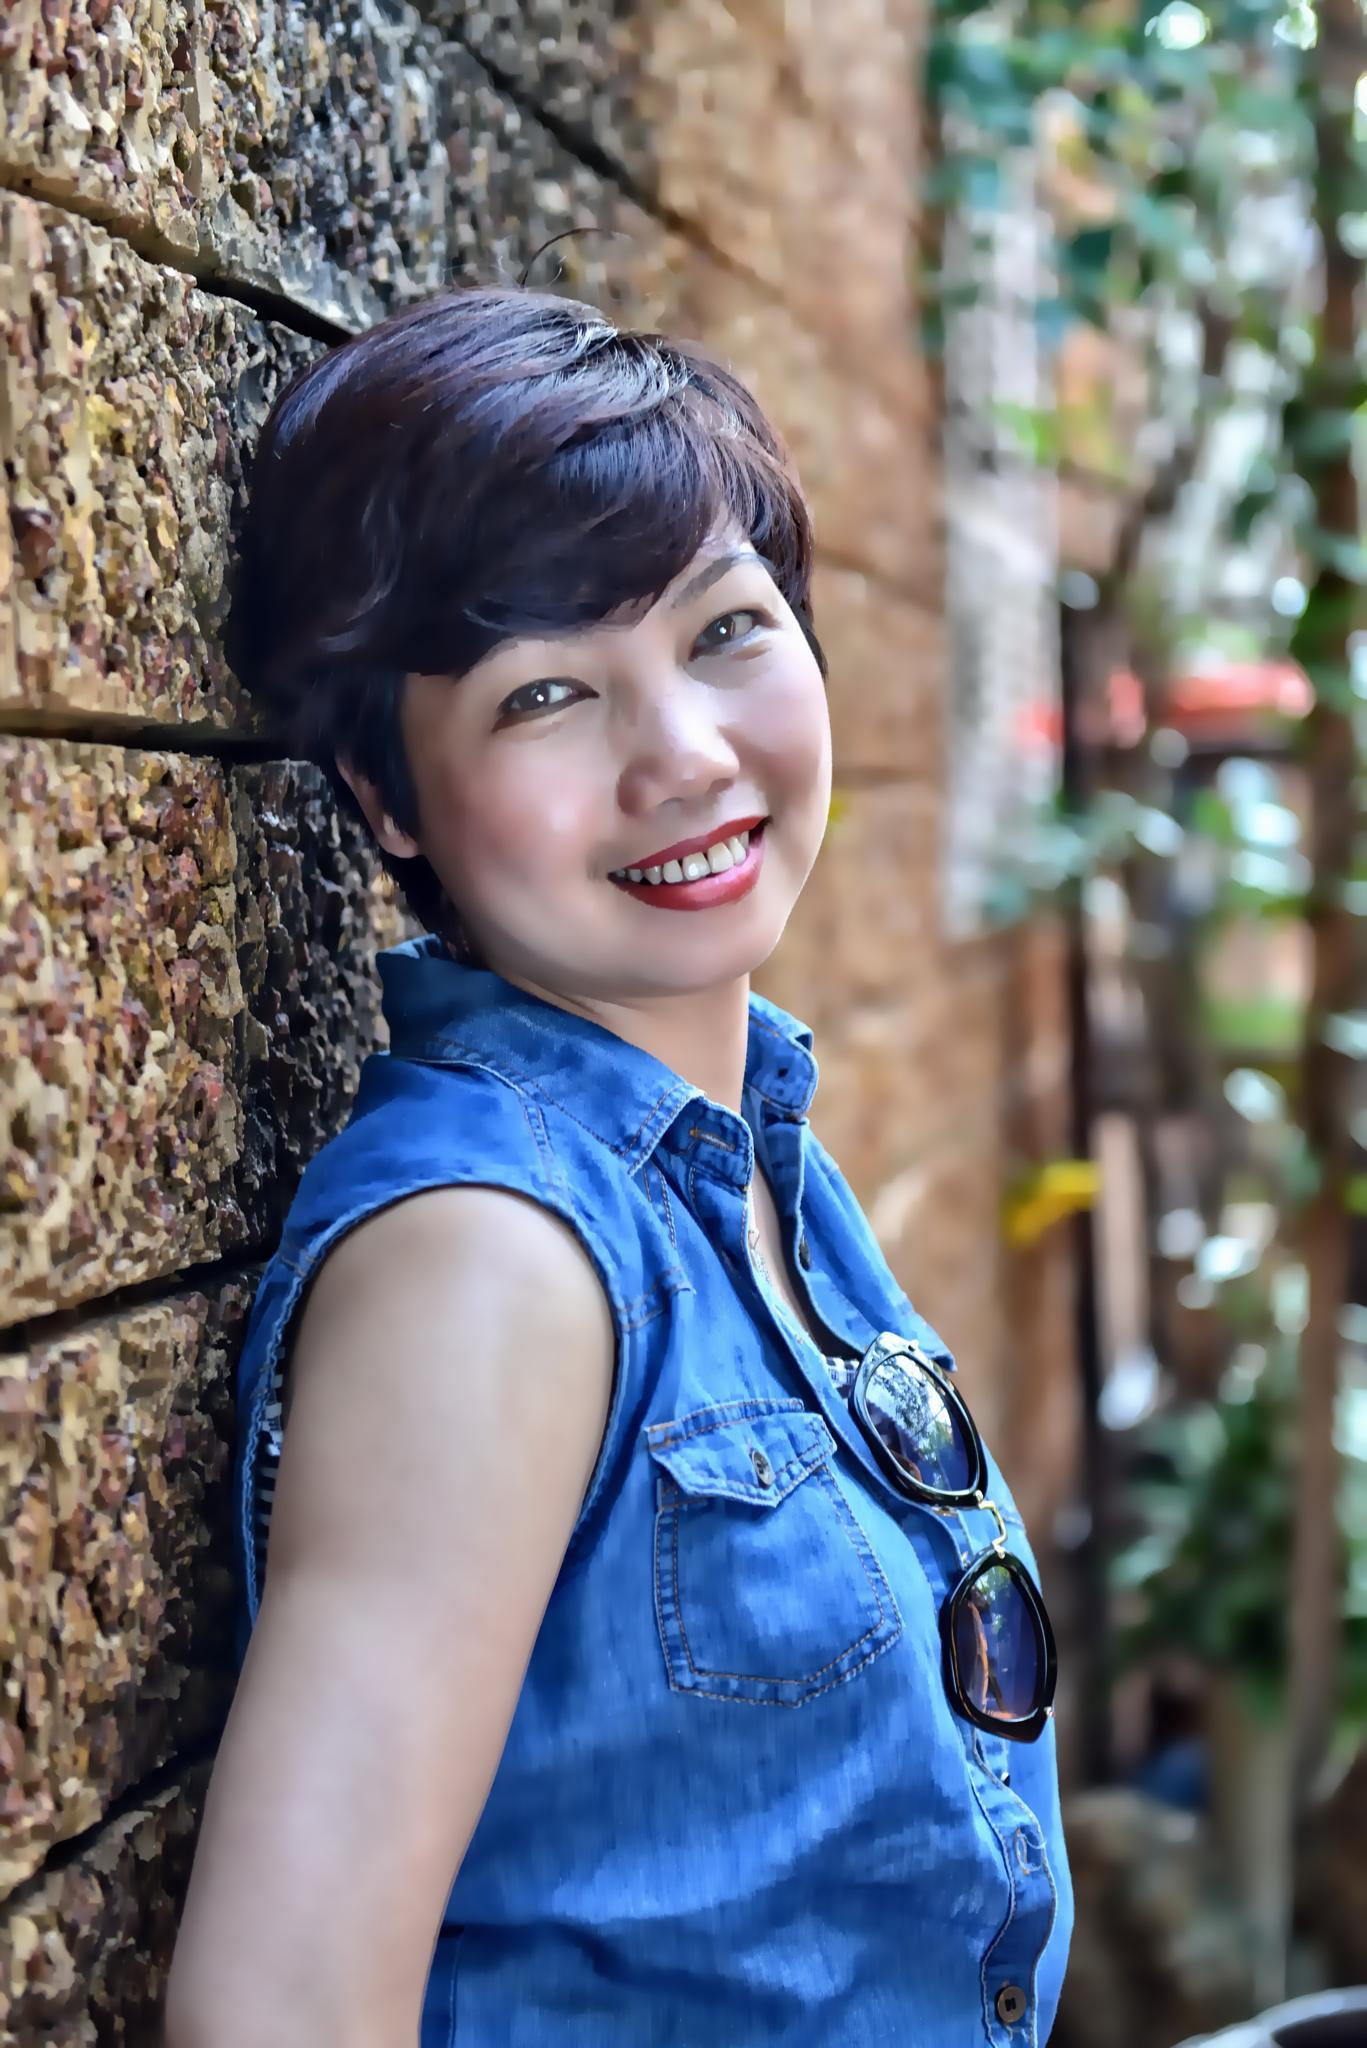 My friend - Phuong Ha by Hung Quang Ngo